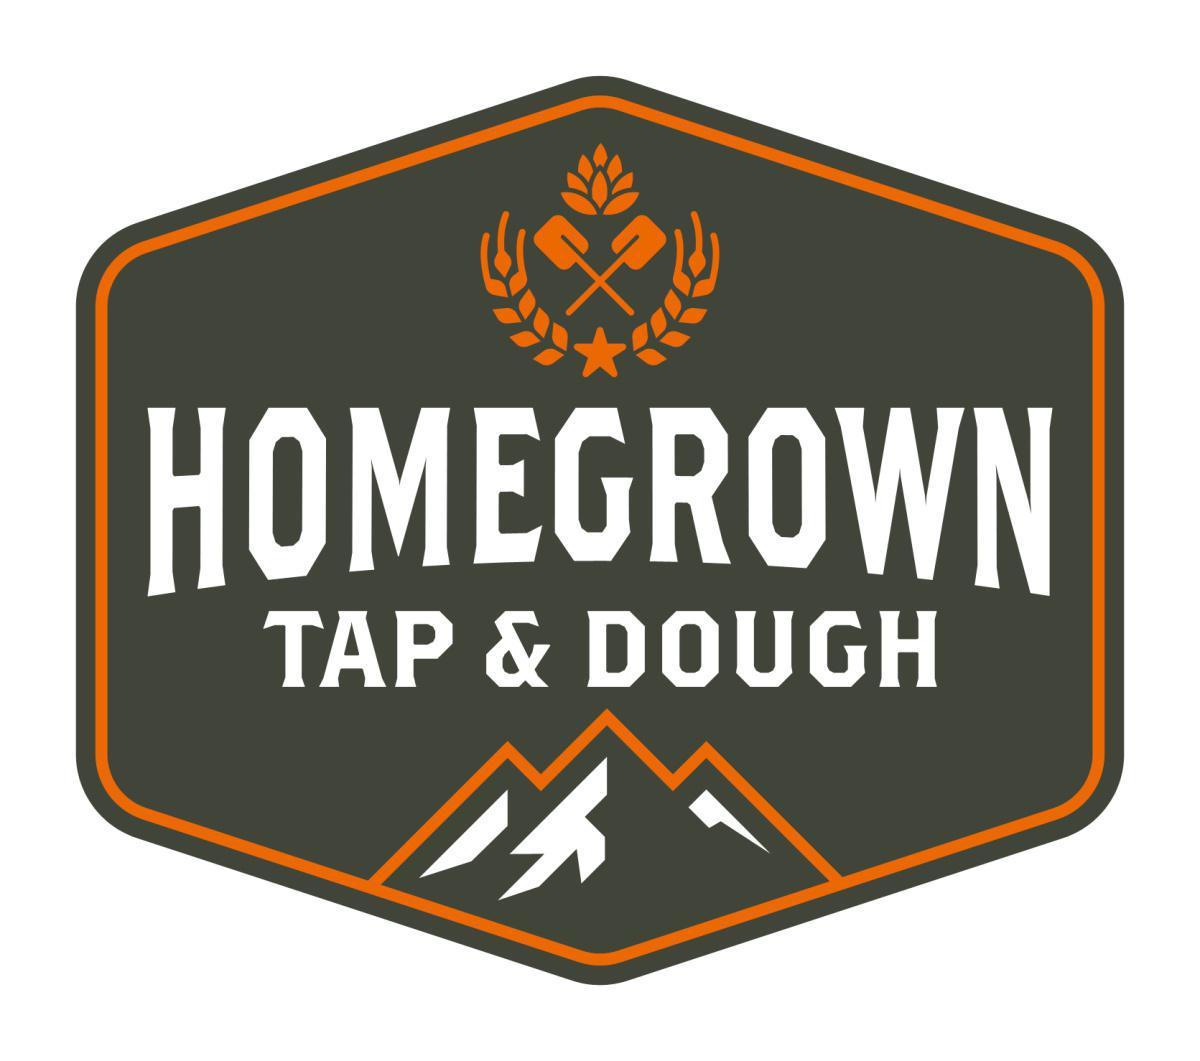 Homegrown Tap & Dough (9PM-10PM)